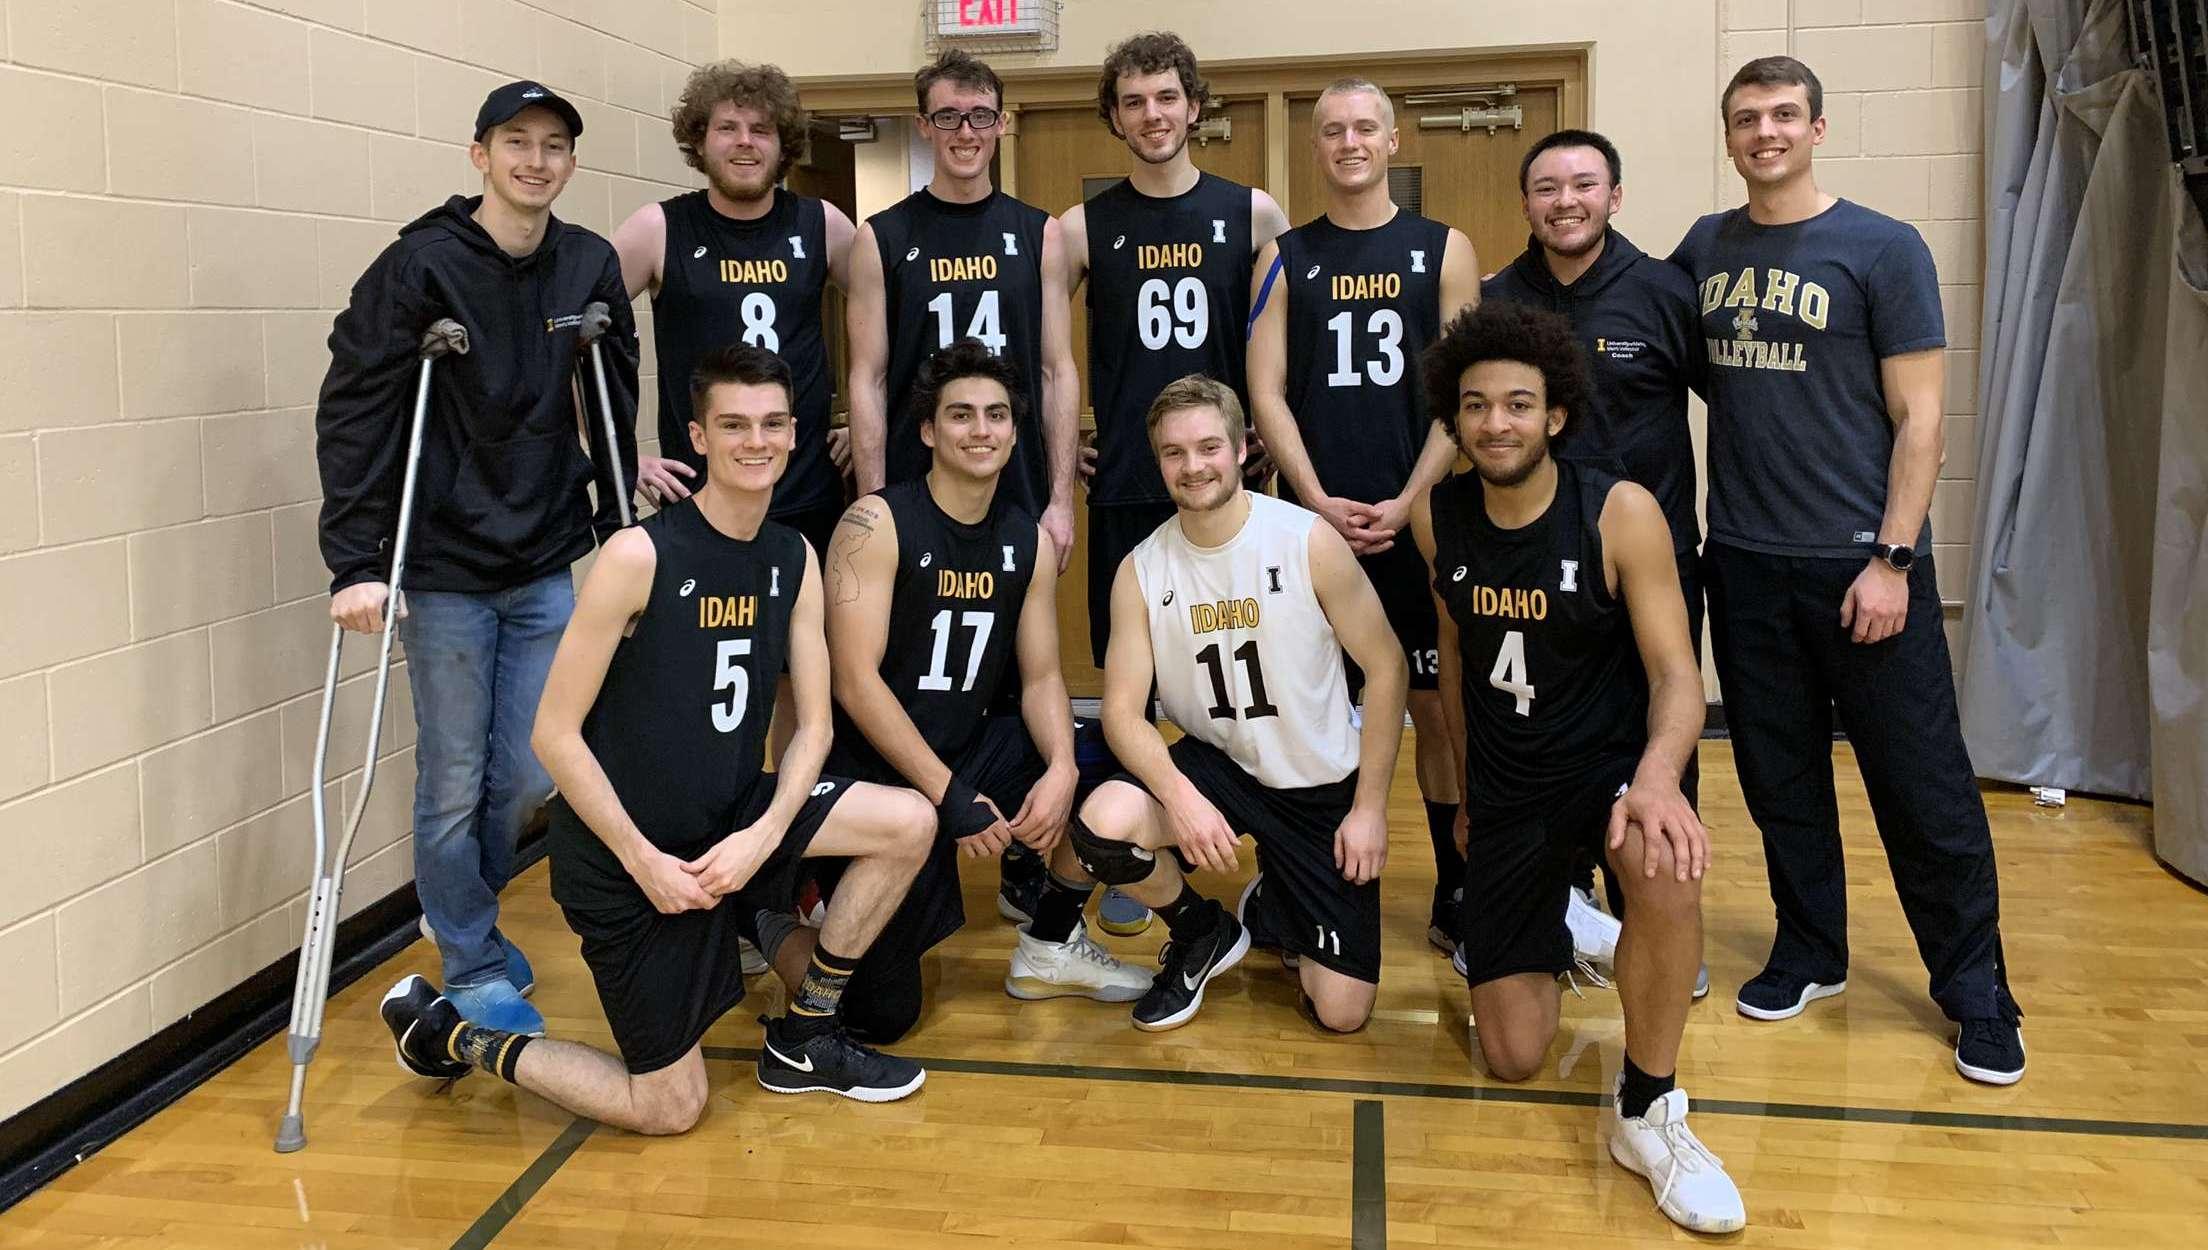 Team Jersey Photo